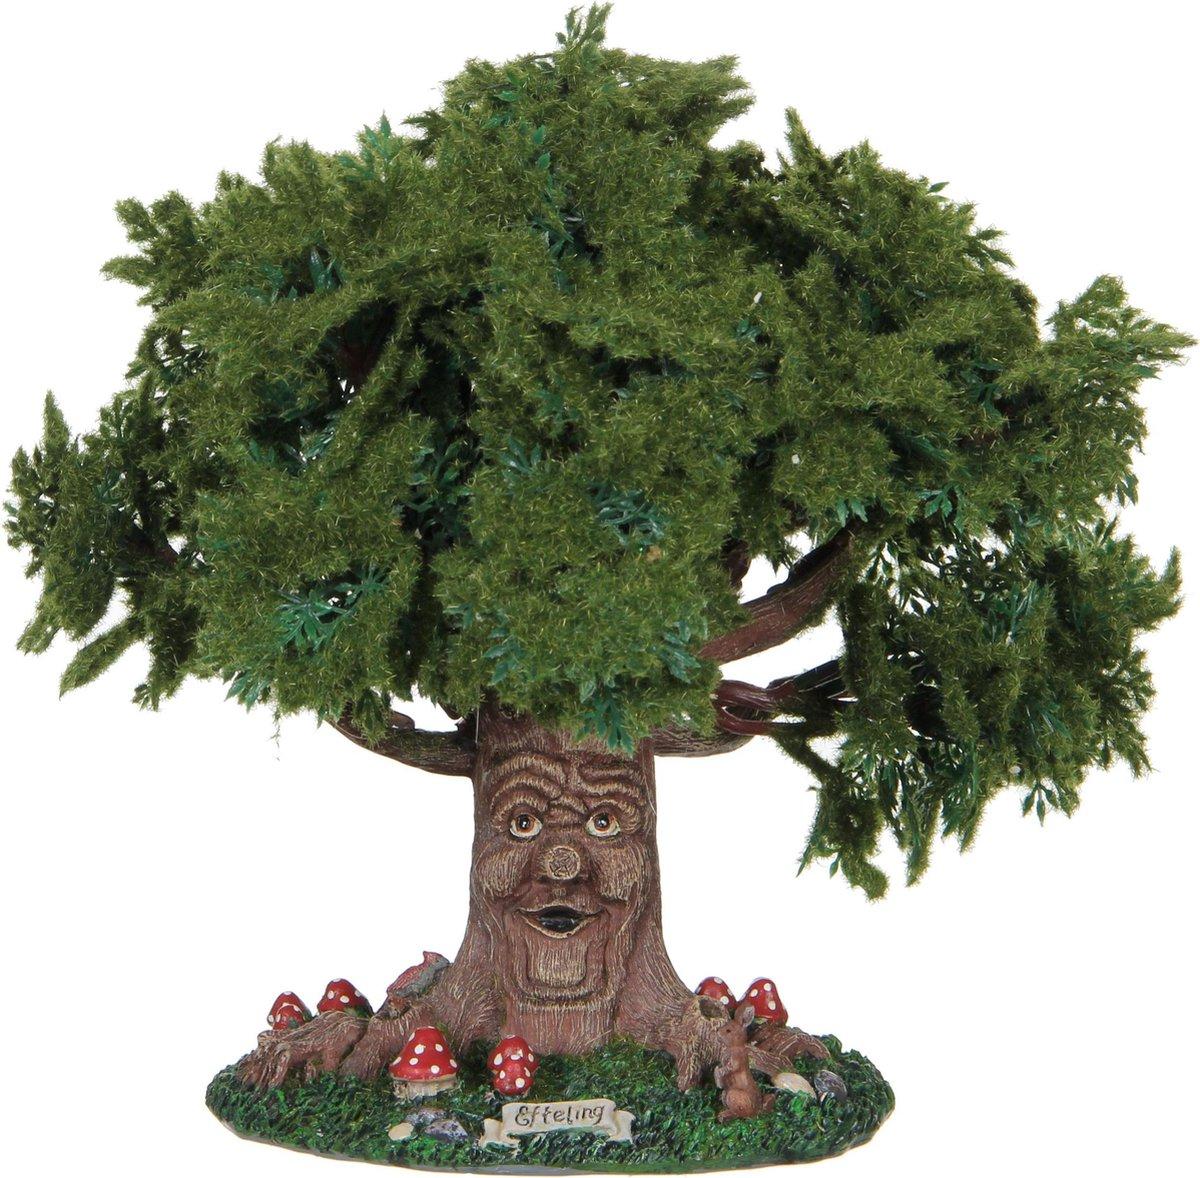 Efteling - Sprookjesboom